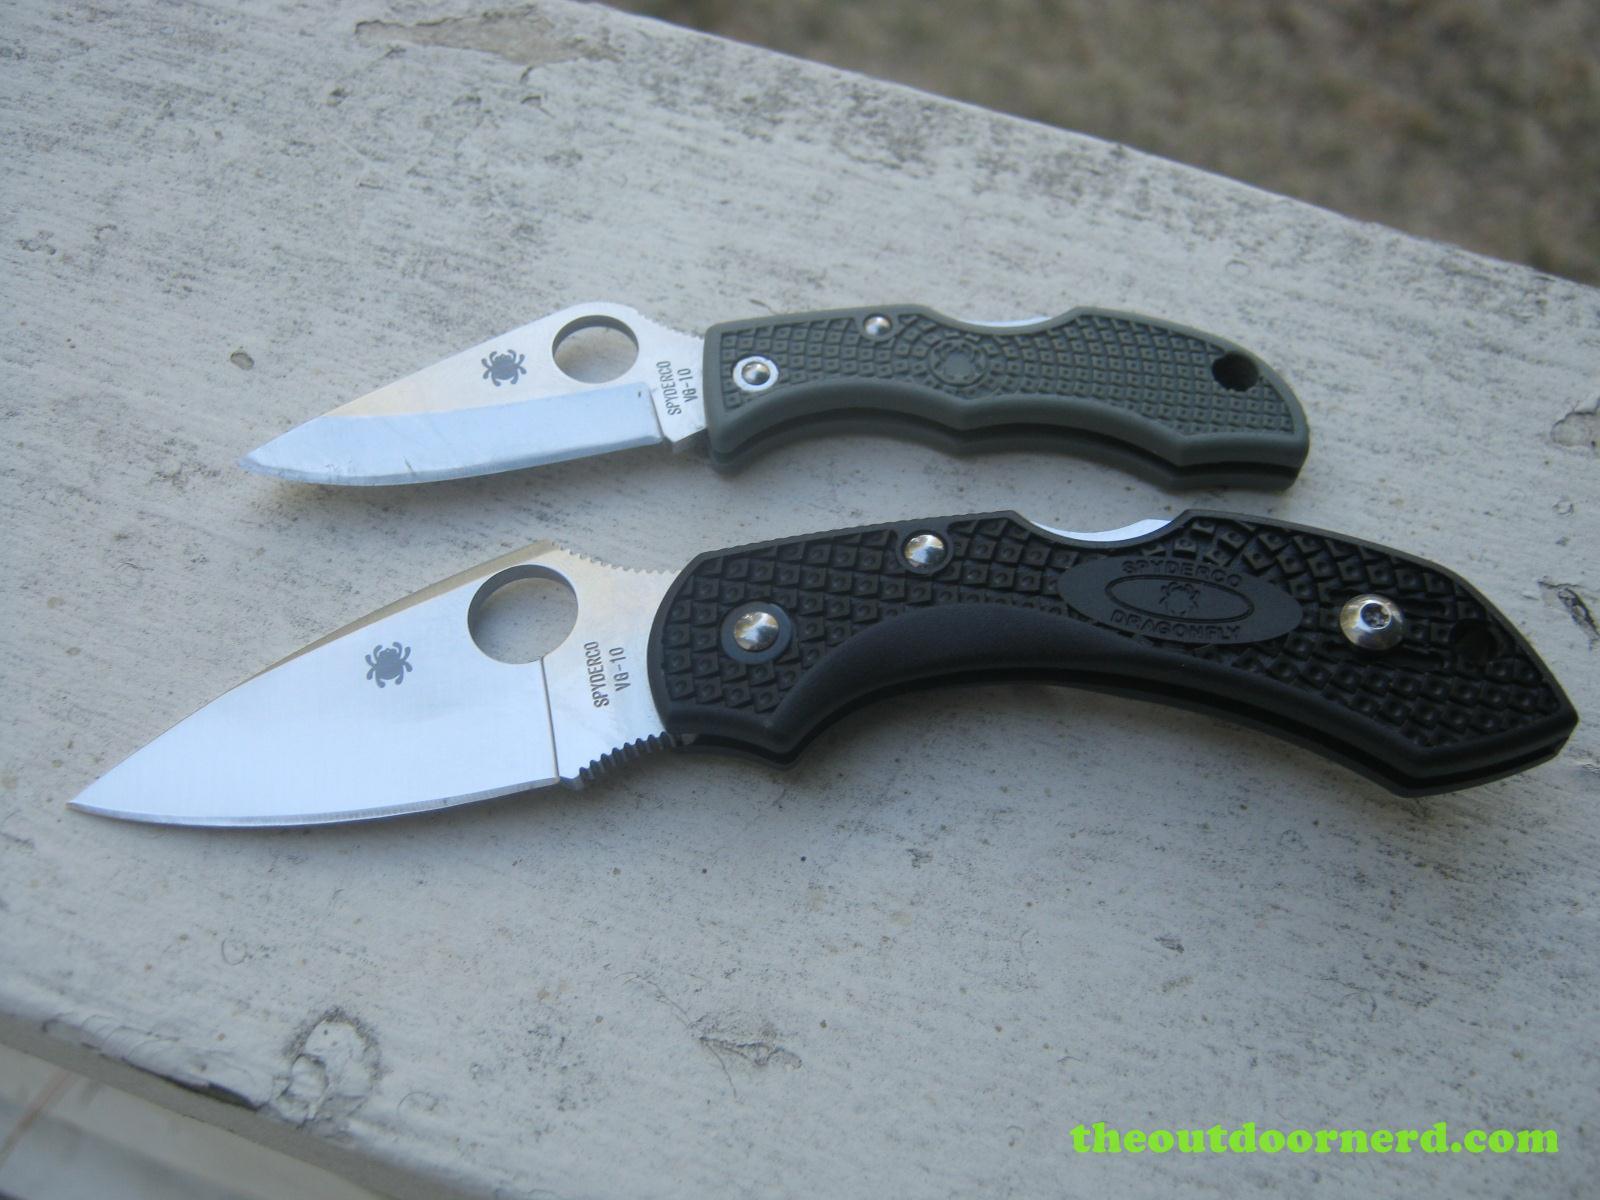 Review: Spyderco Dragonfly 2 [Pocker Knife] | The Outdoor Nerd